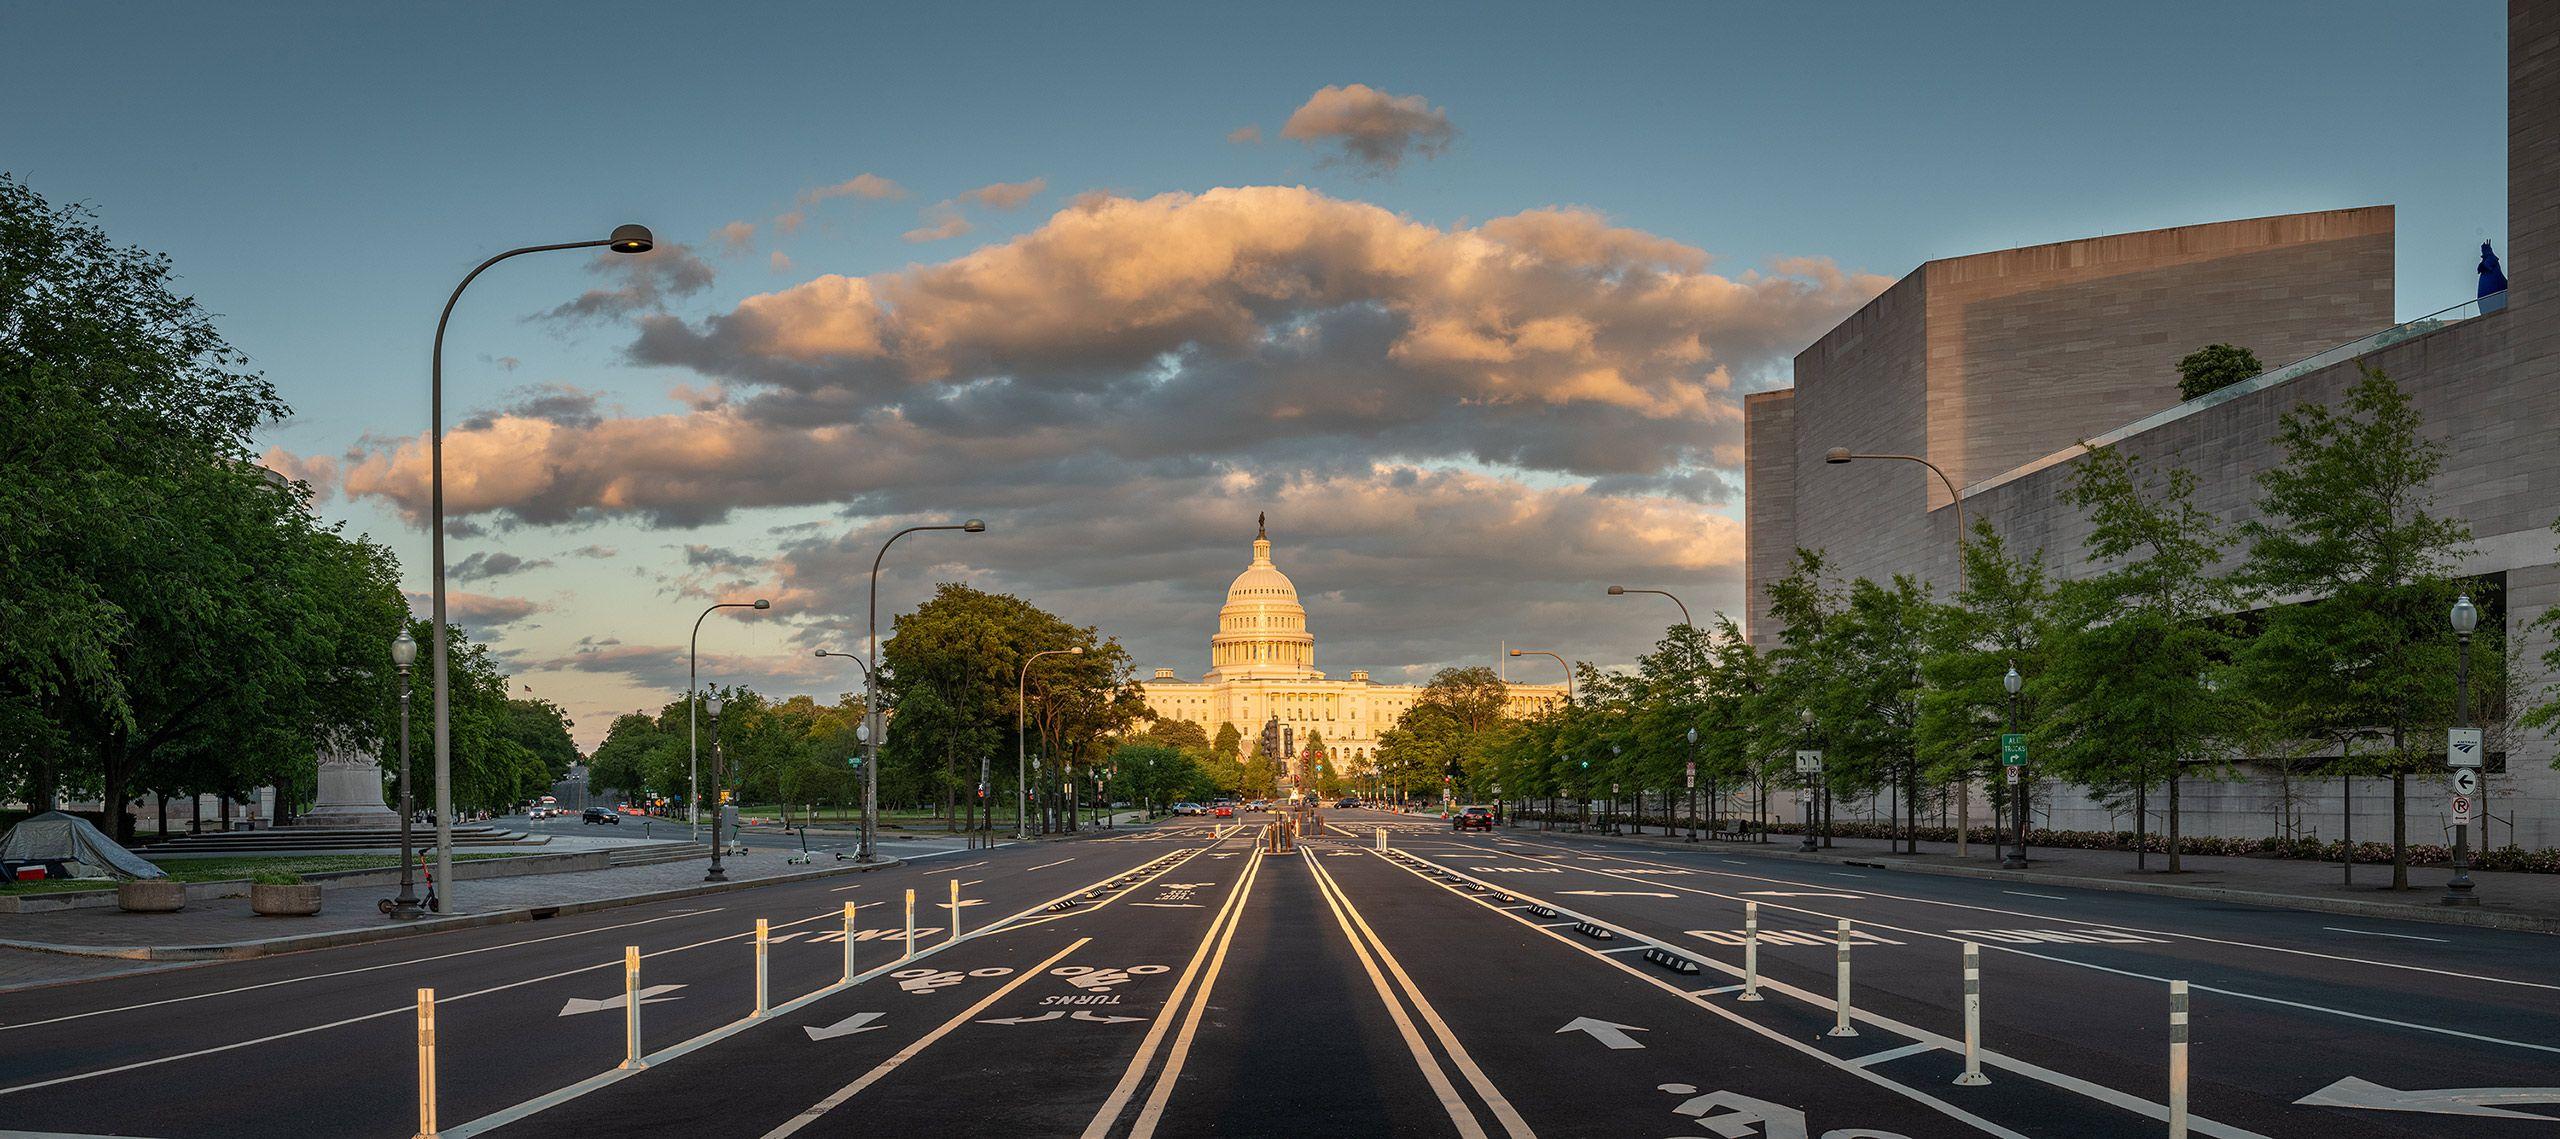 D-21-05-08-8386_405-HDR-Pano-(US-Capitol).jpg